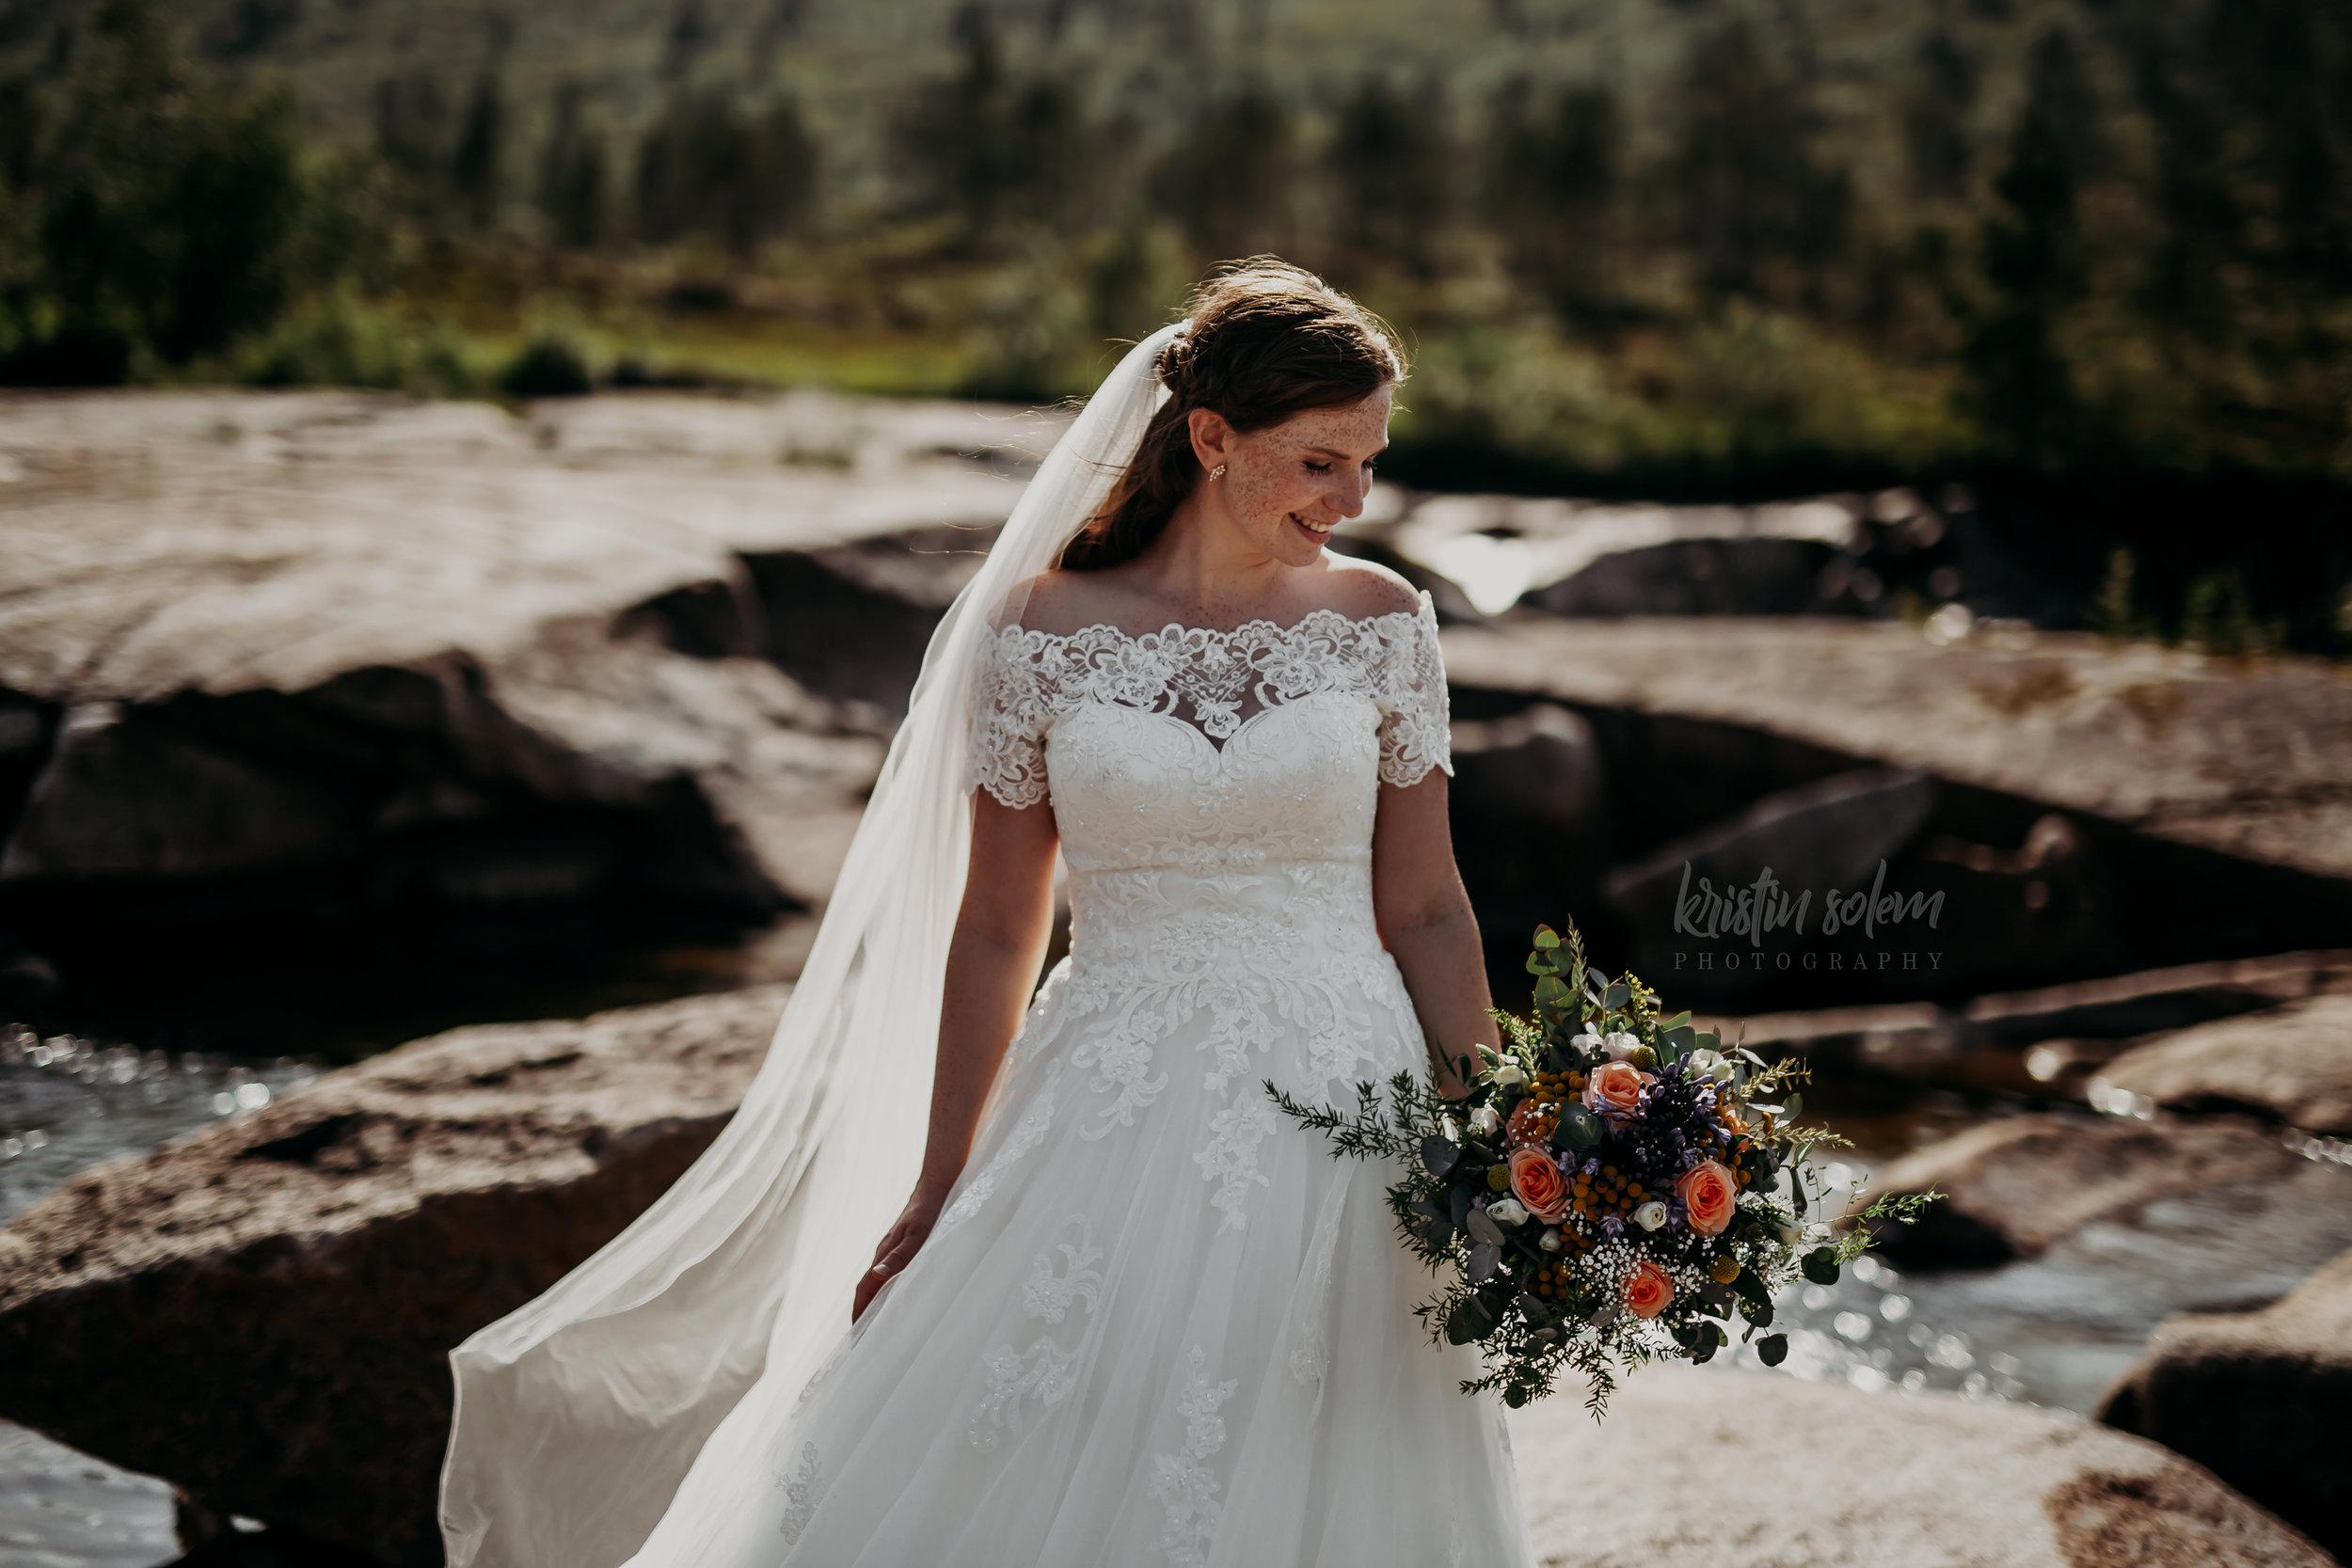 fotograf kristin solem_bryllup rindal surnadal